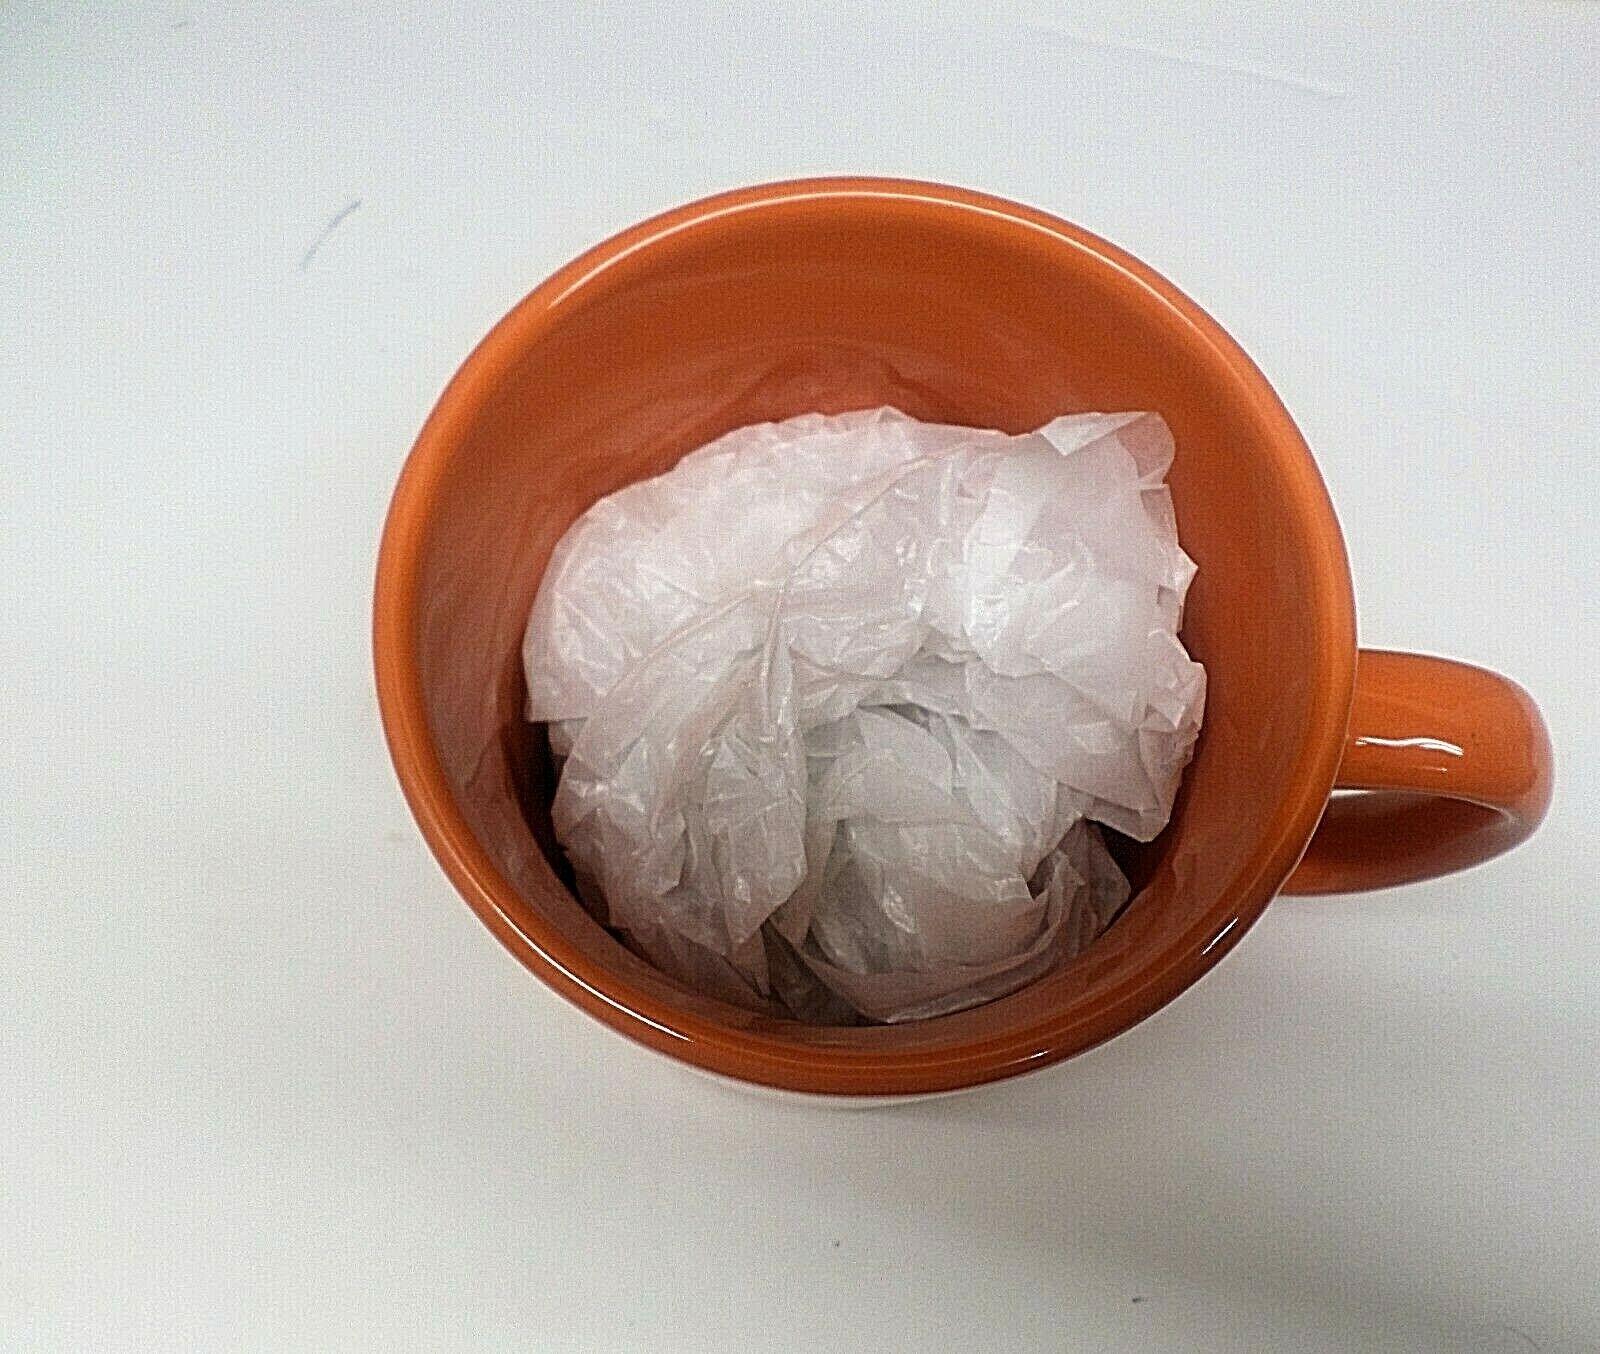 Купить Reese's Peanut Butter Cup - HUGE* Reese's Peanut Butter Cup Ceramic COFFEE TEA MUG CUP Giant Soup Bowl